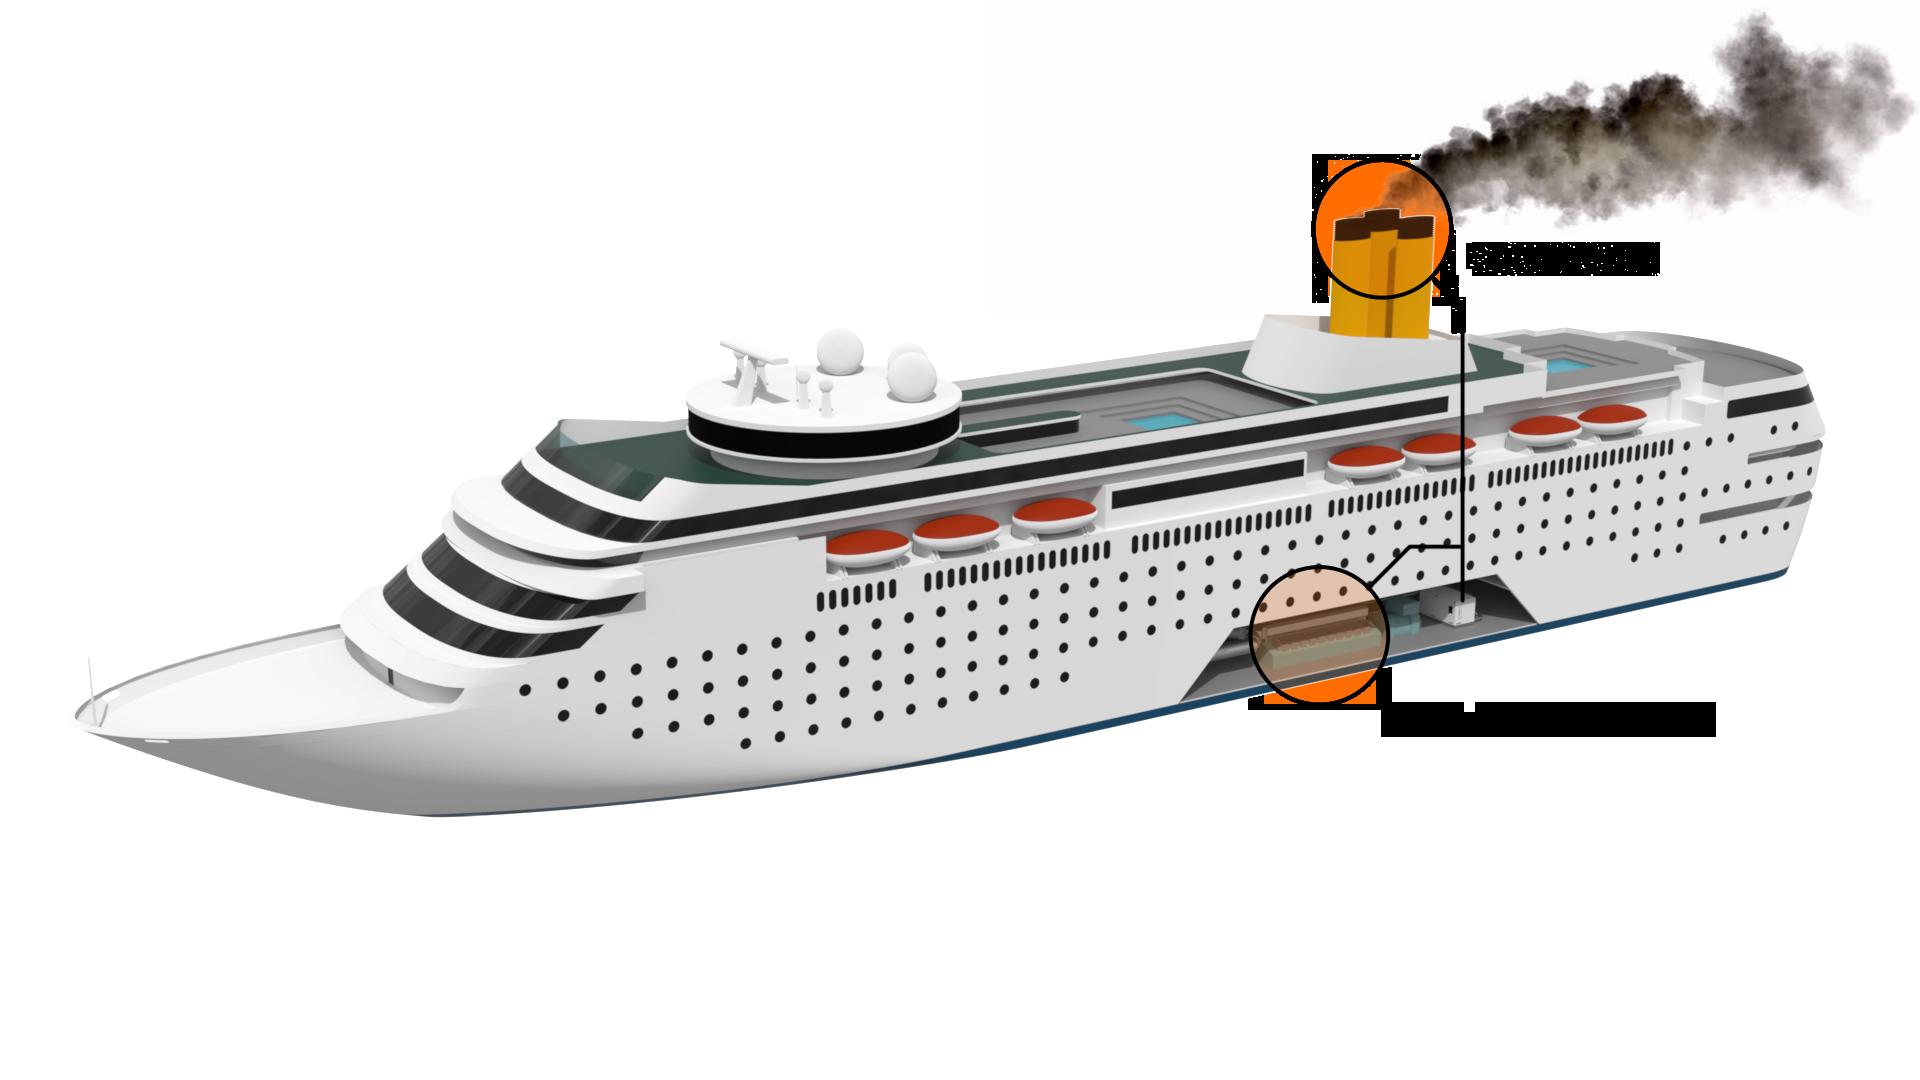 bk-maritime-1-1 9-frilagd-med-text